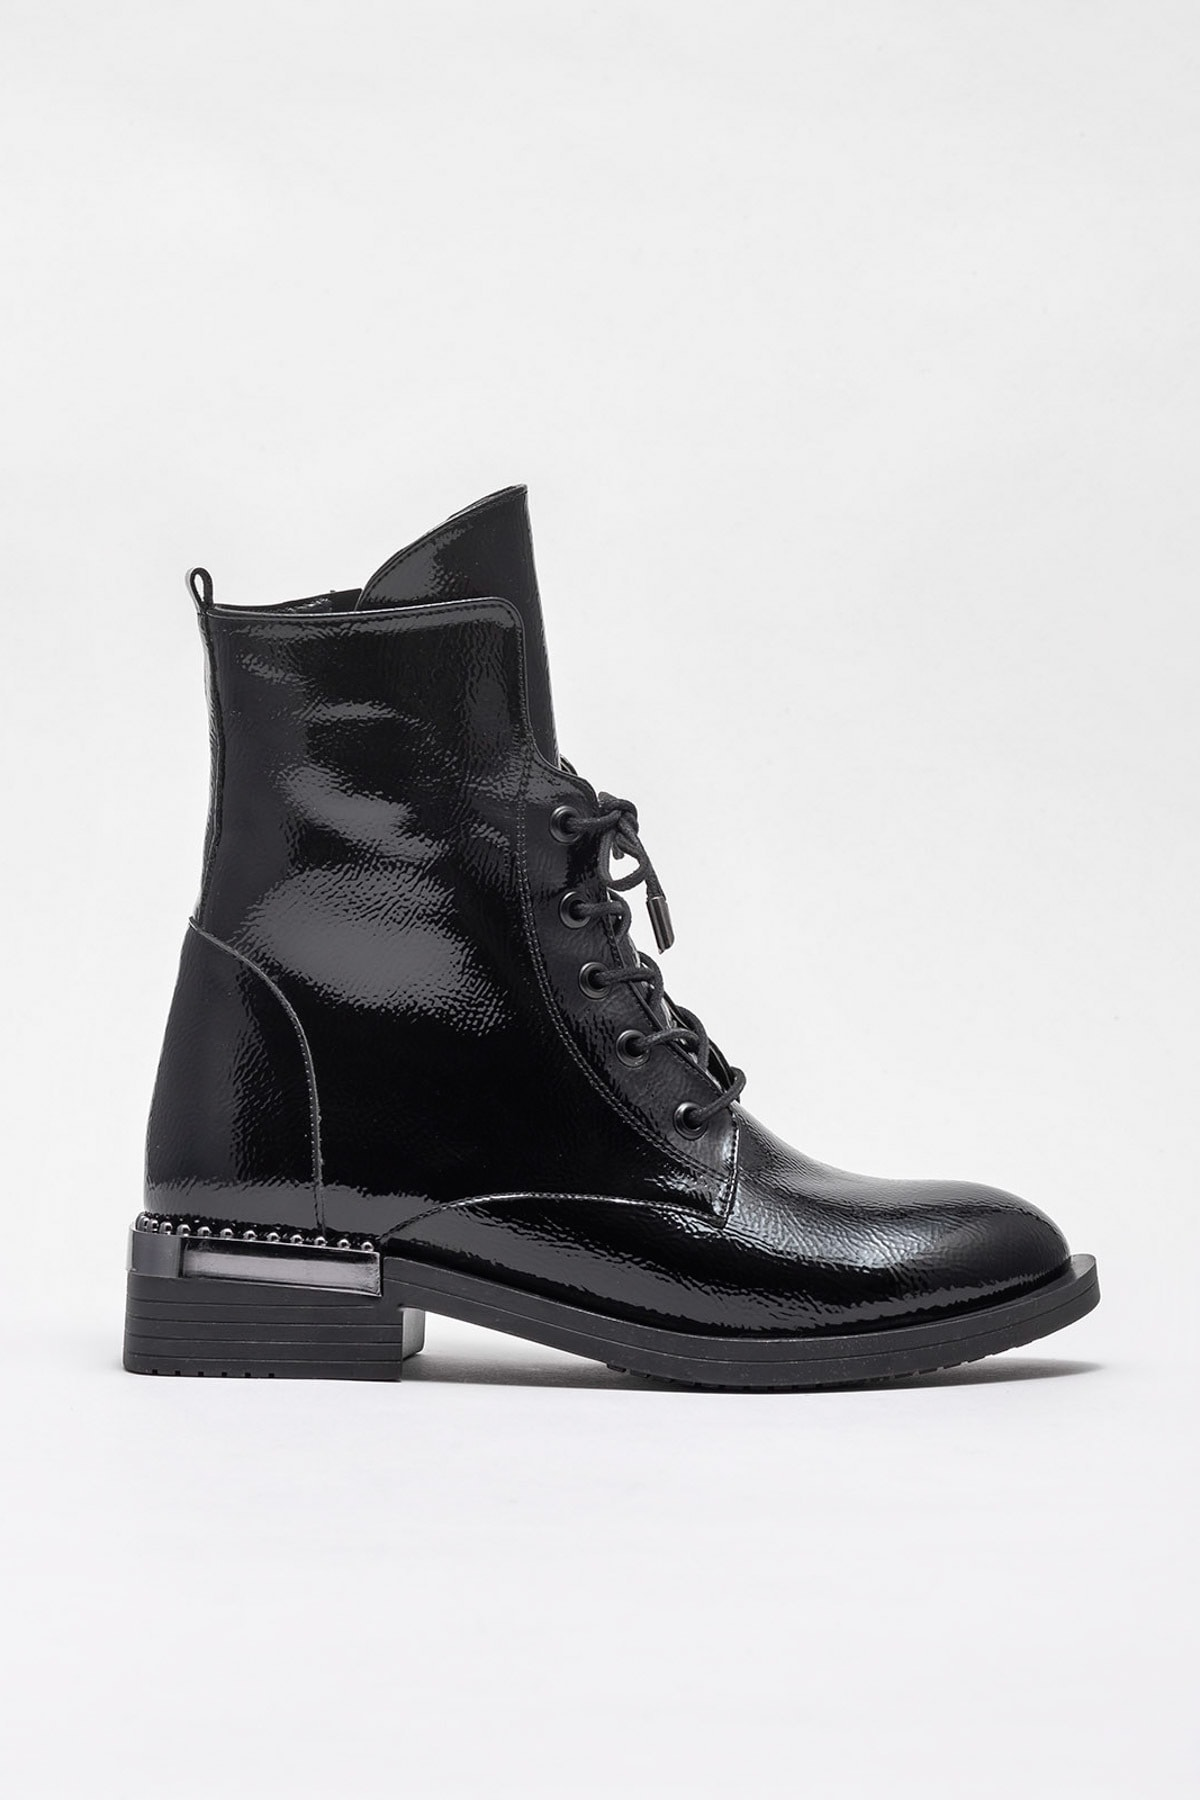 Elle Shoes Kadın Bot & Bootie Flode 20KUS5003 1